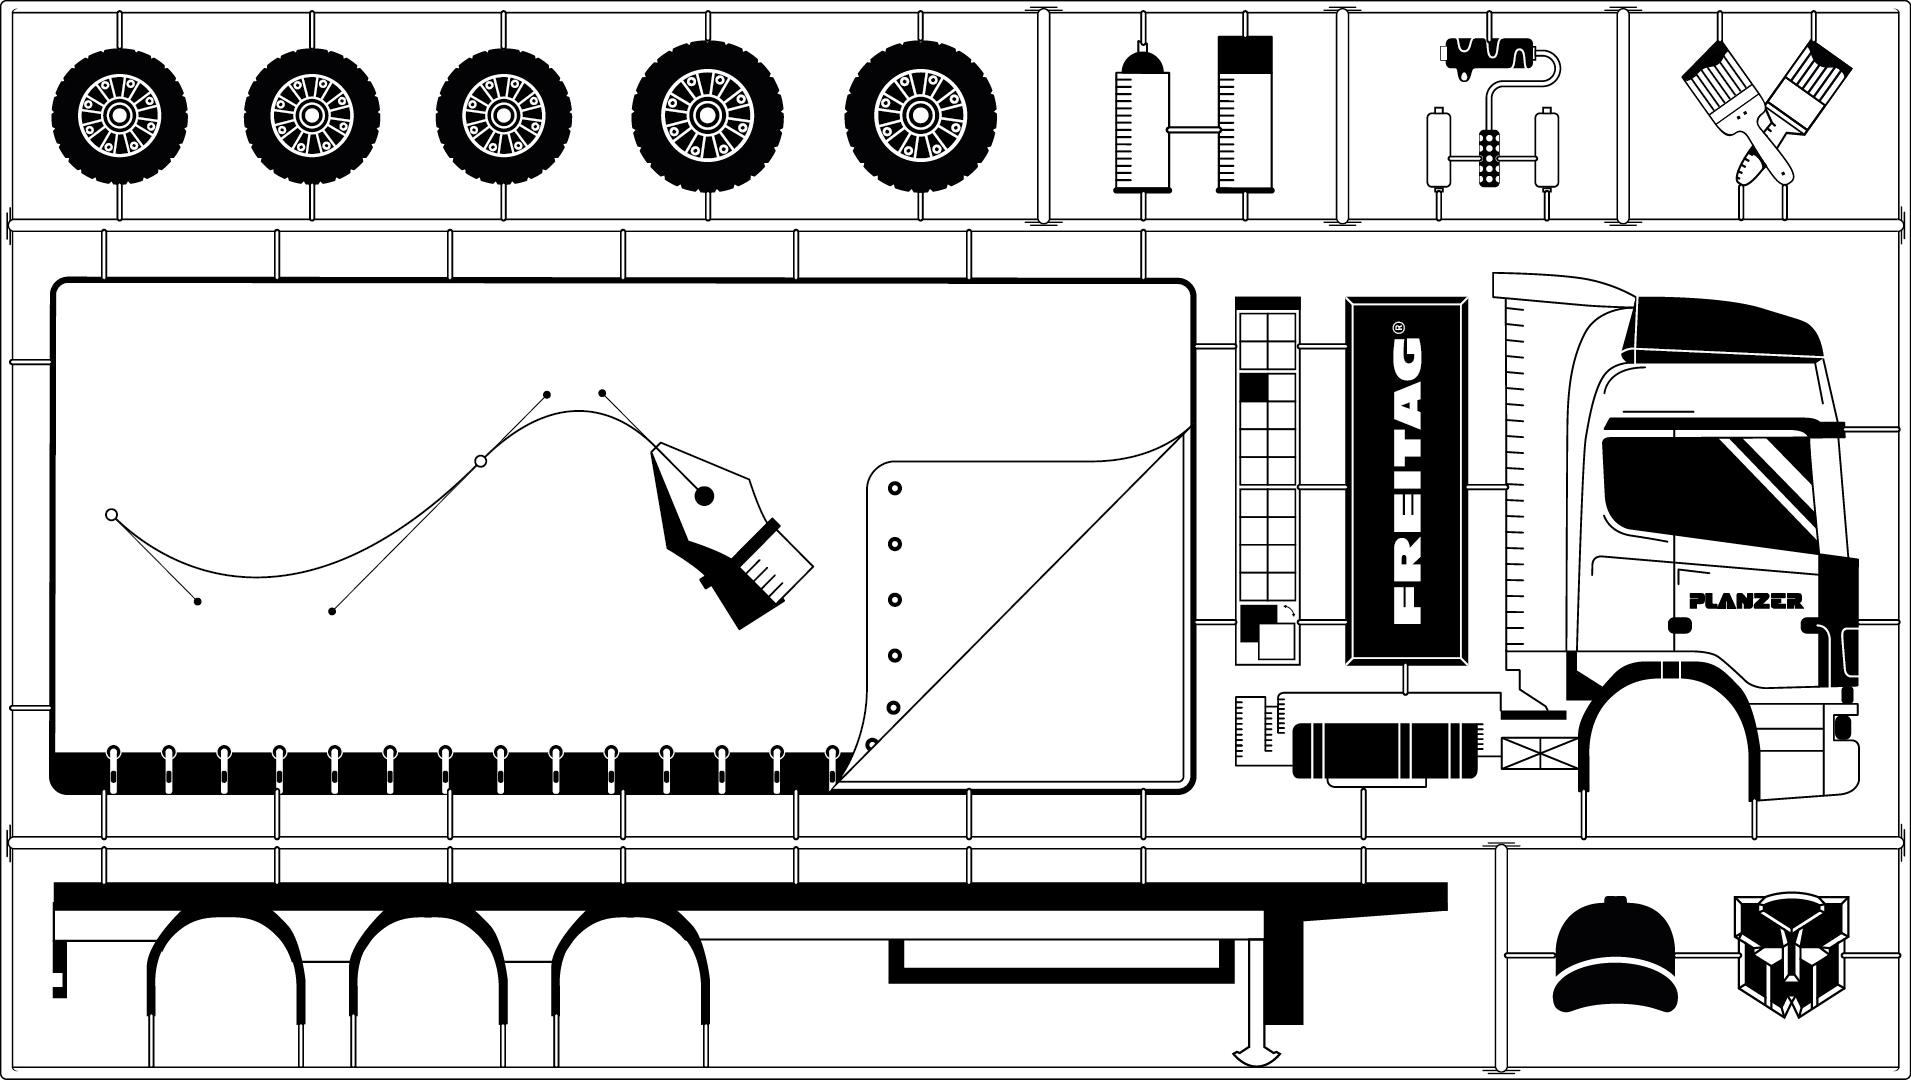 Design-A-Truck_468x269_high_res_visual